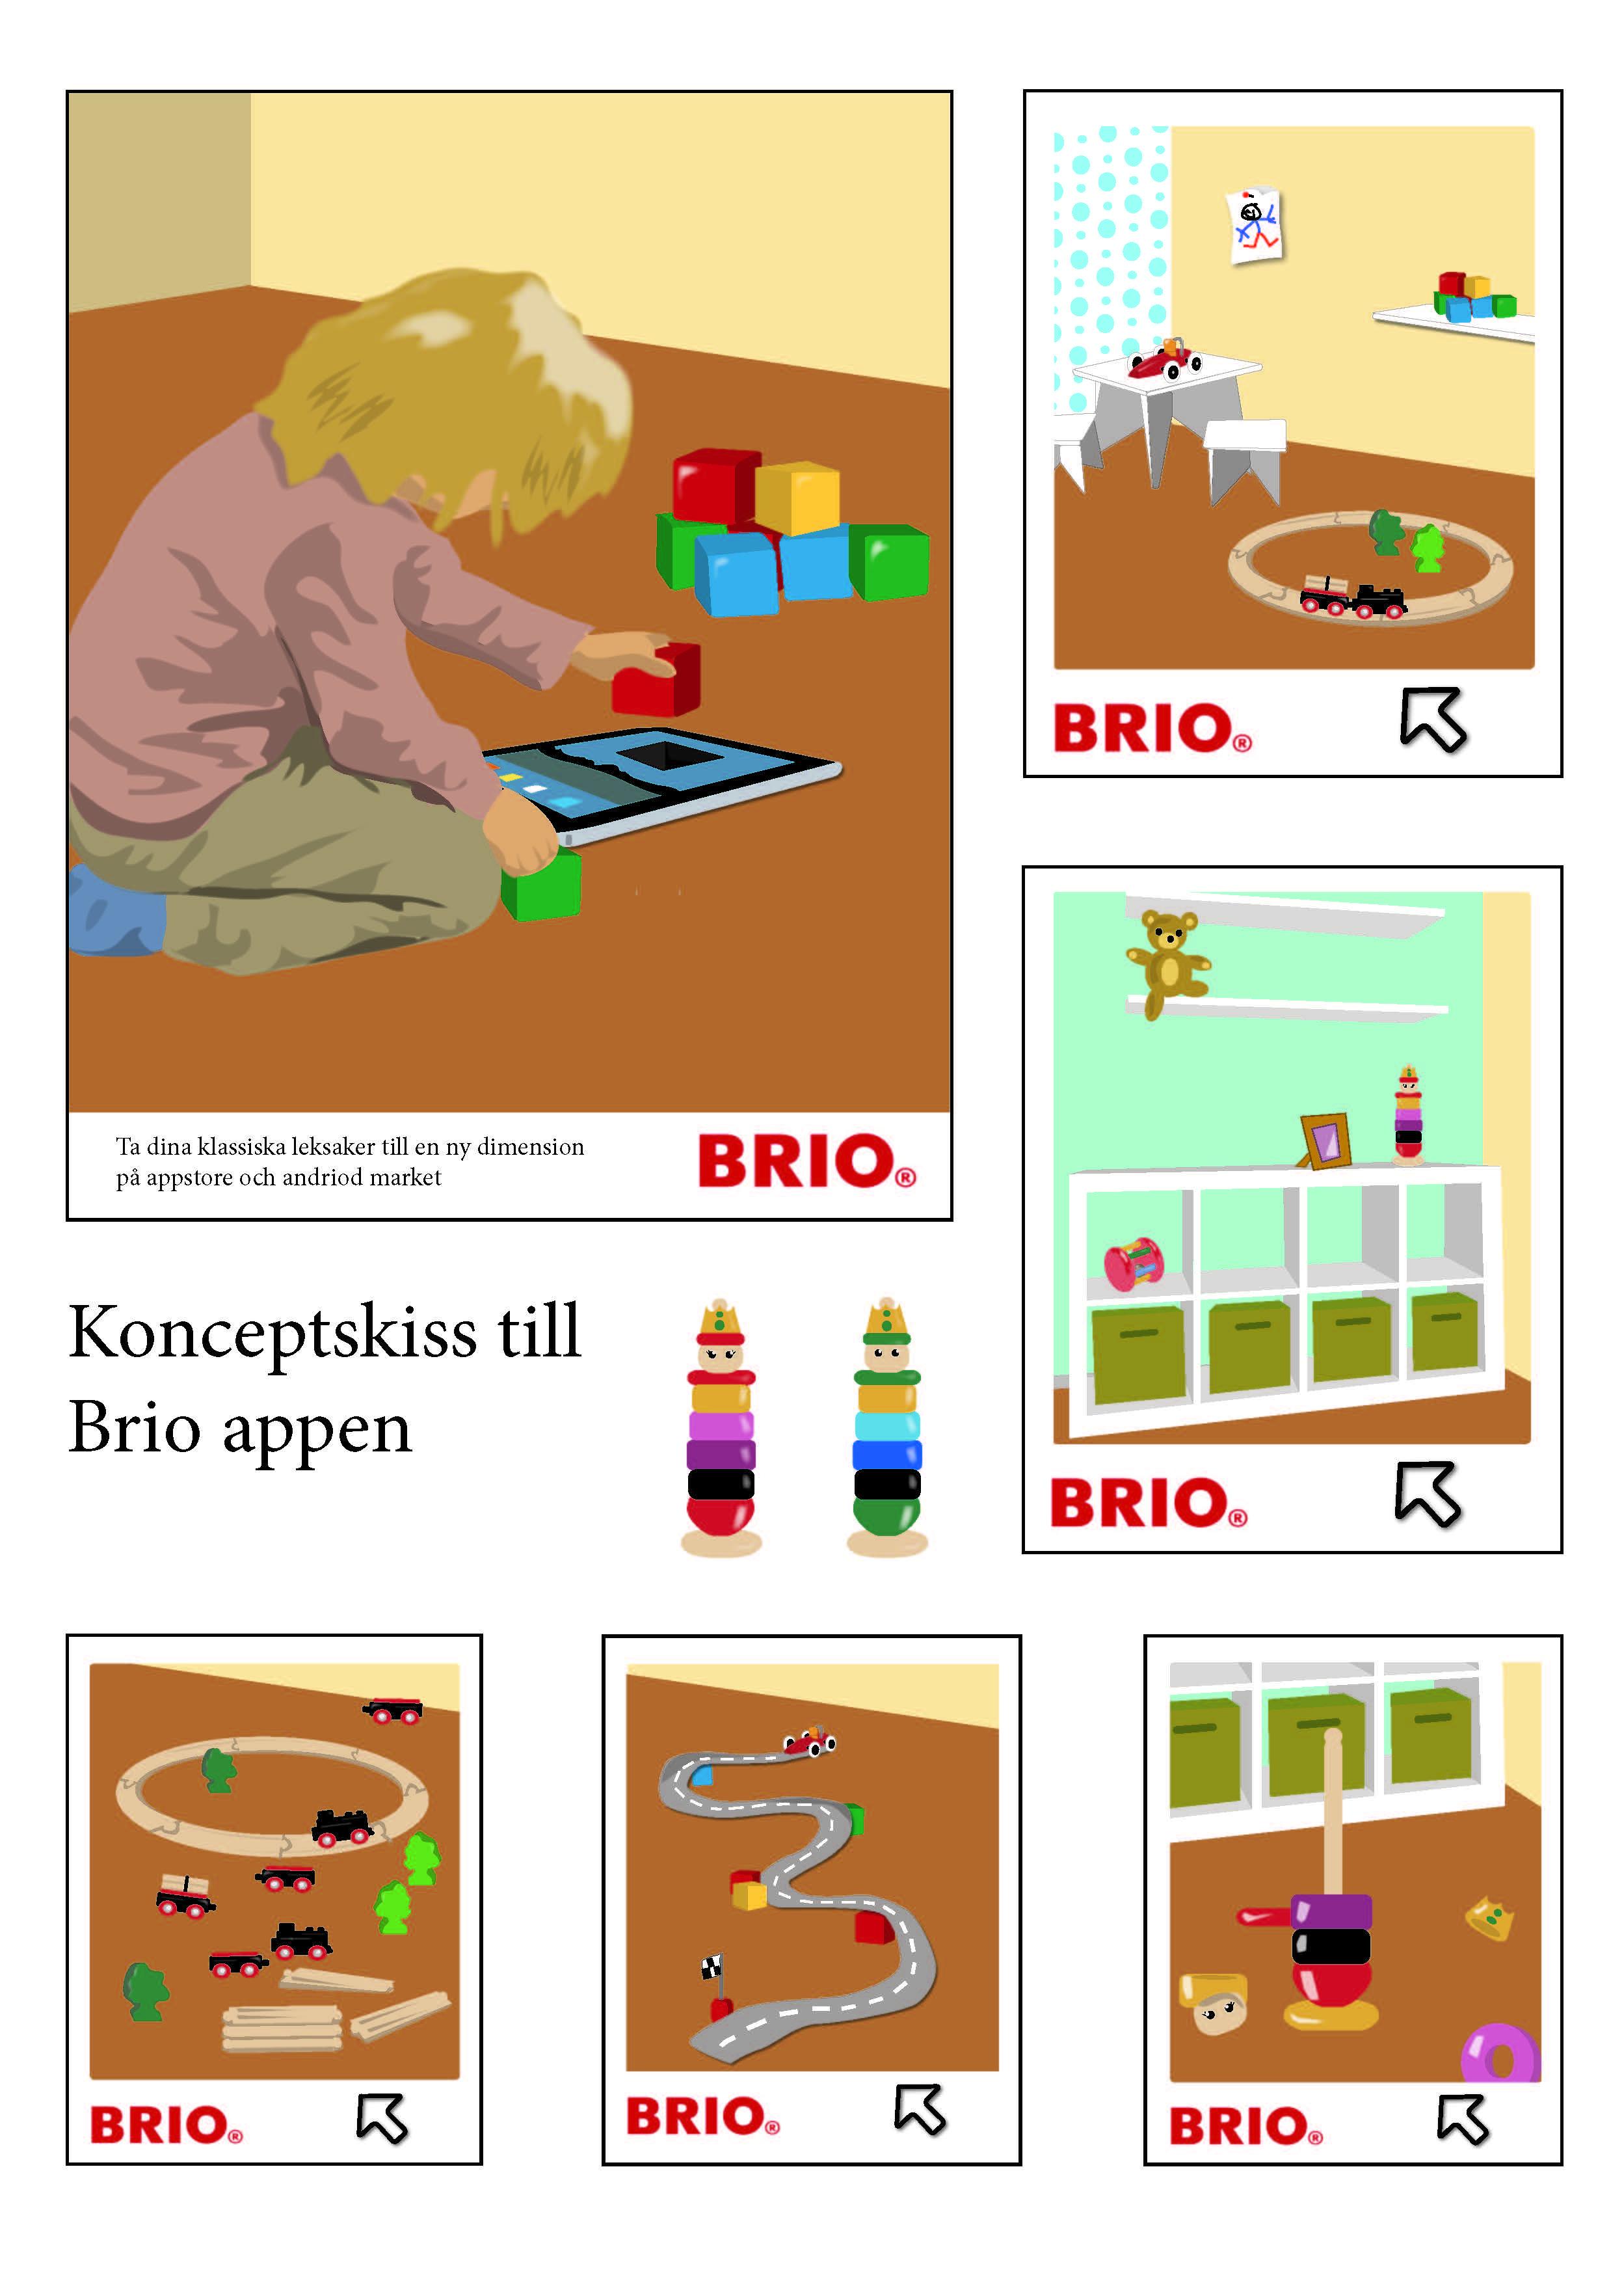 Brio –Appkonceptet